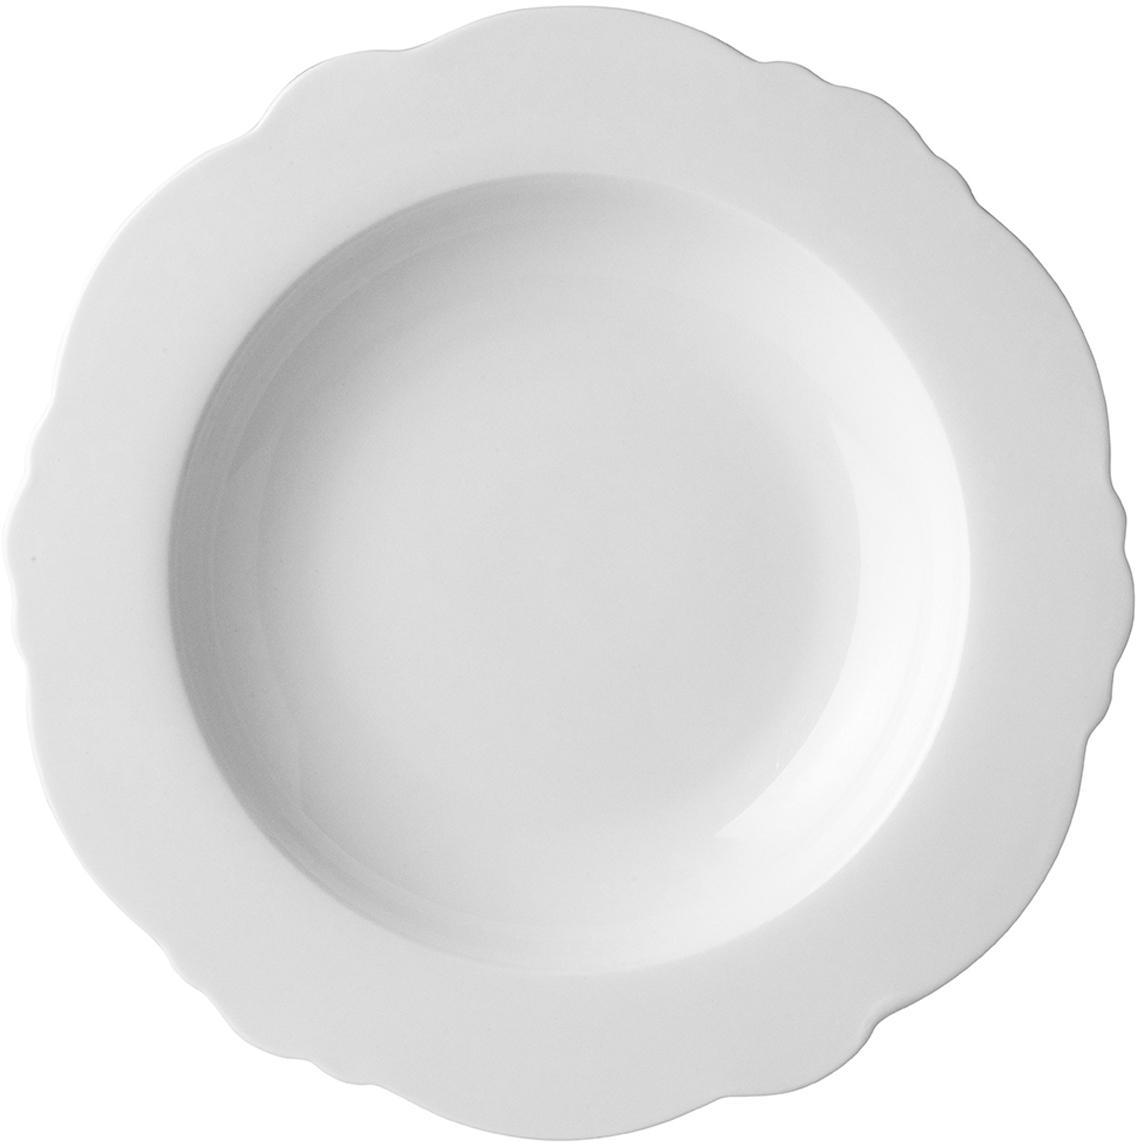 Platos hondos Muschel Loft, 4uds., Porcelana, Blanco, Ø 23 x Al 3 cm